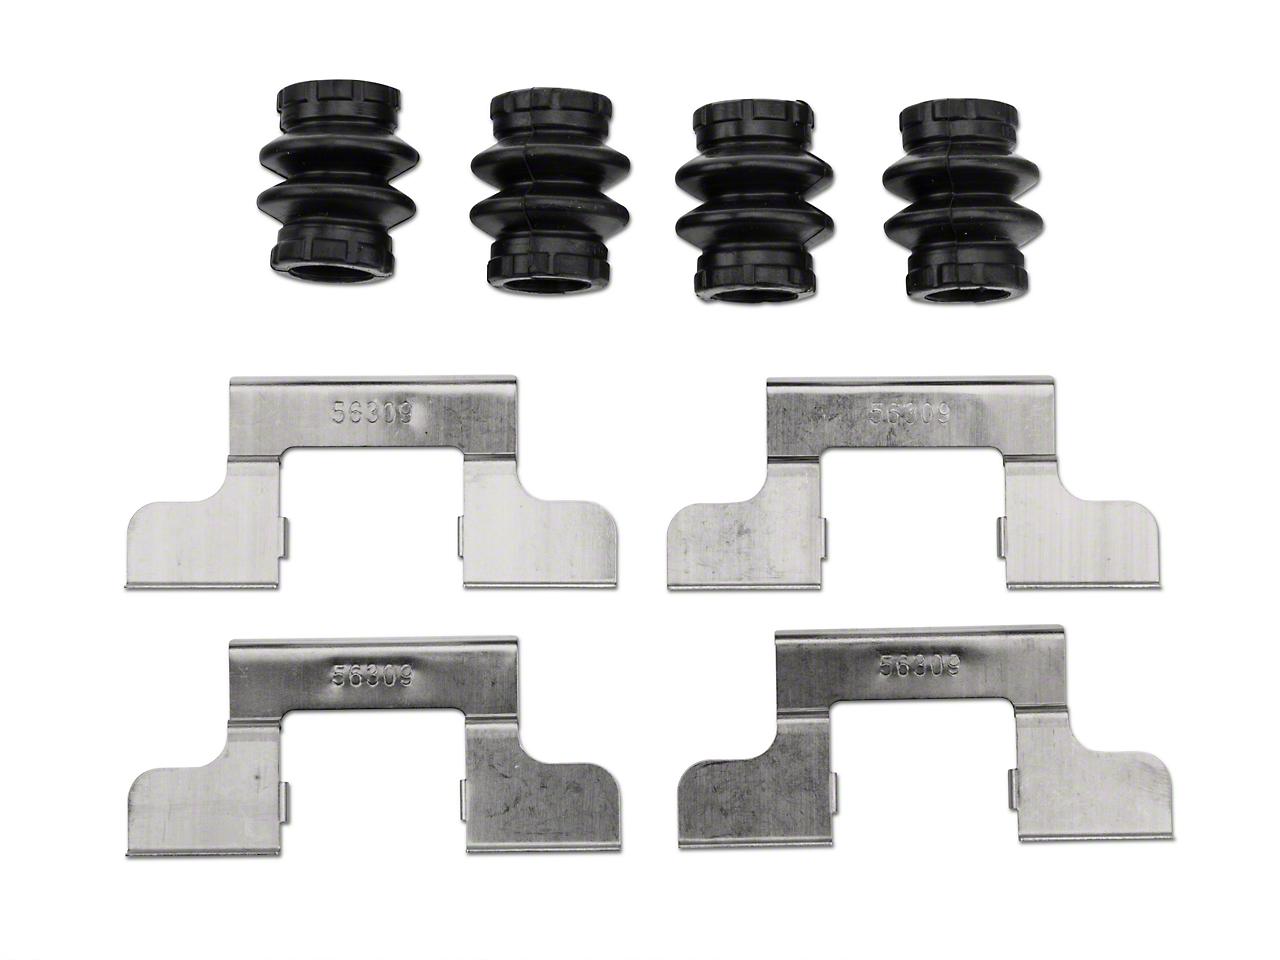 OPR Rear Disc Brake Hardware Kit (05-11 All)